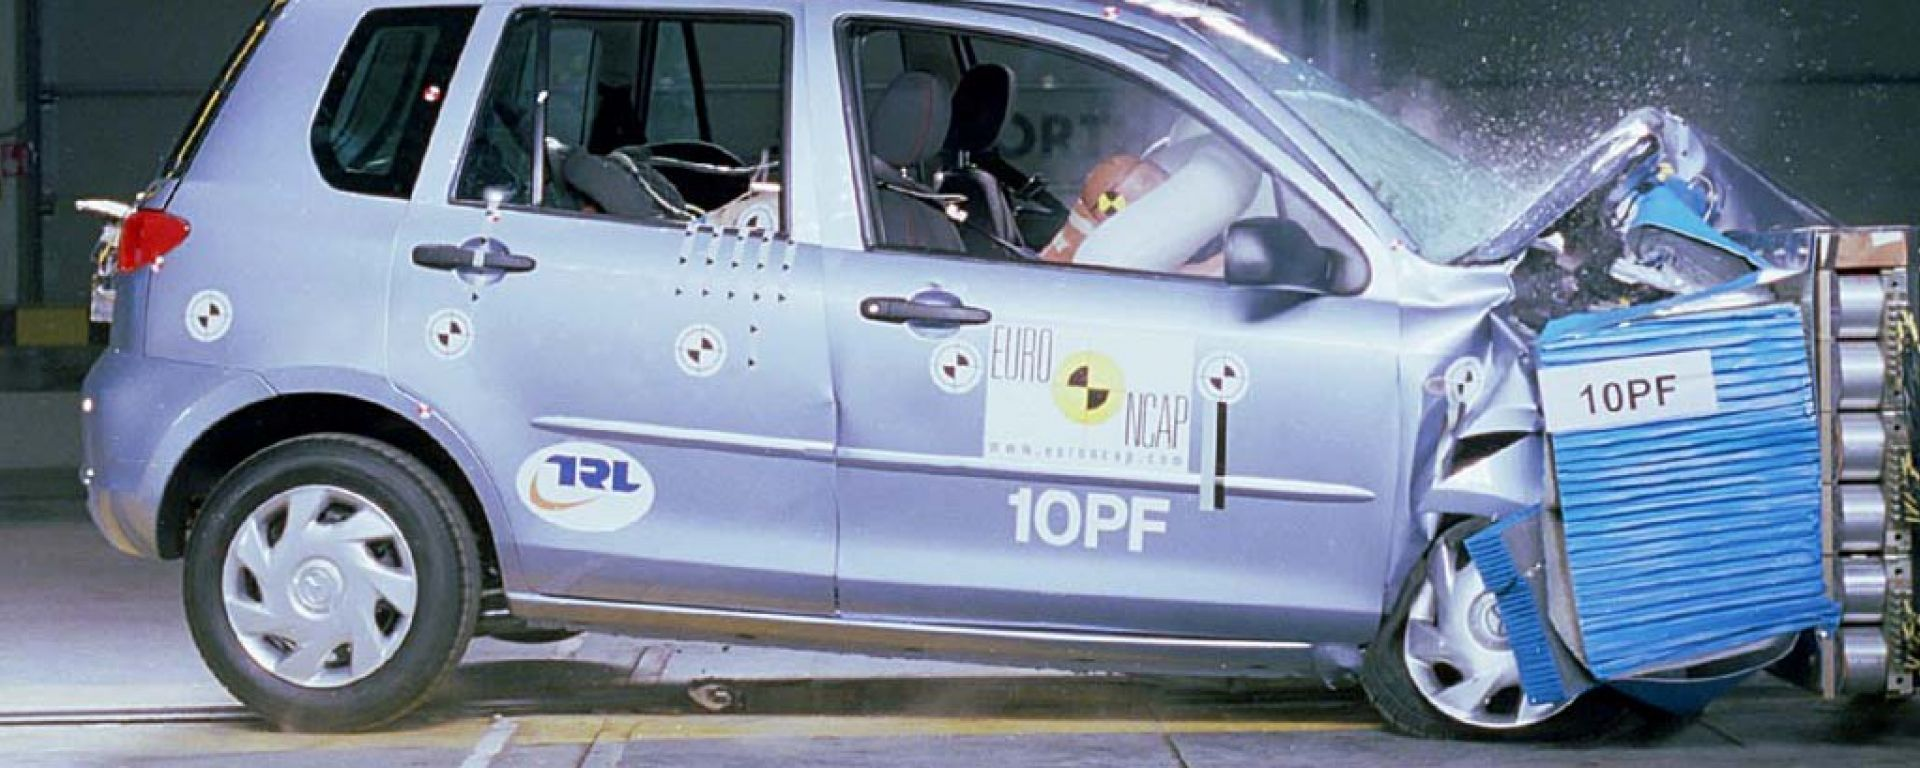 Crash test: i risultati di novembre 2003